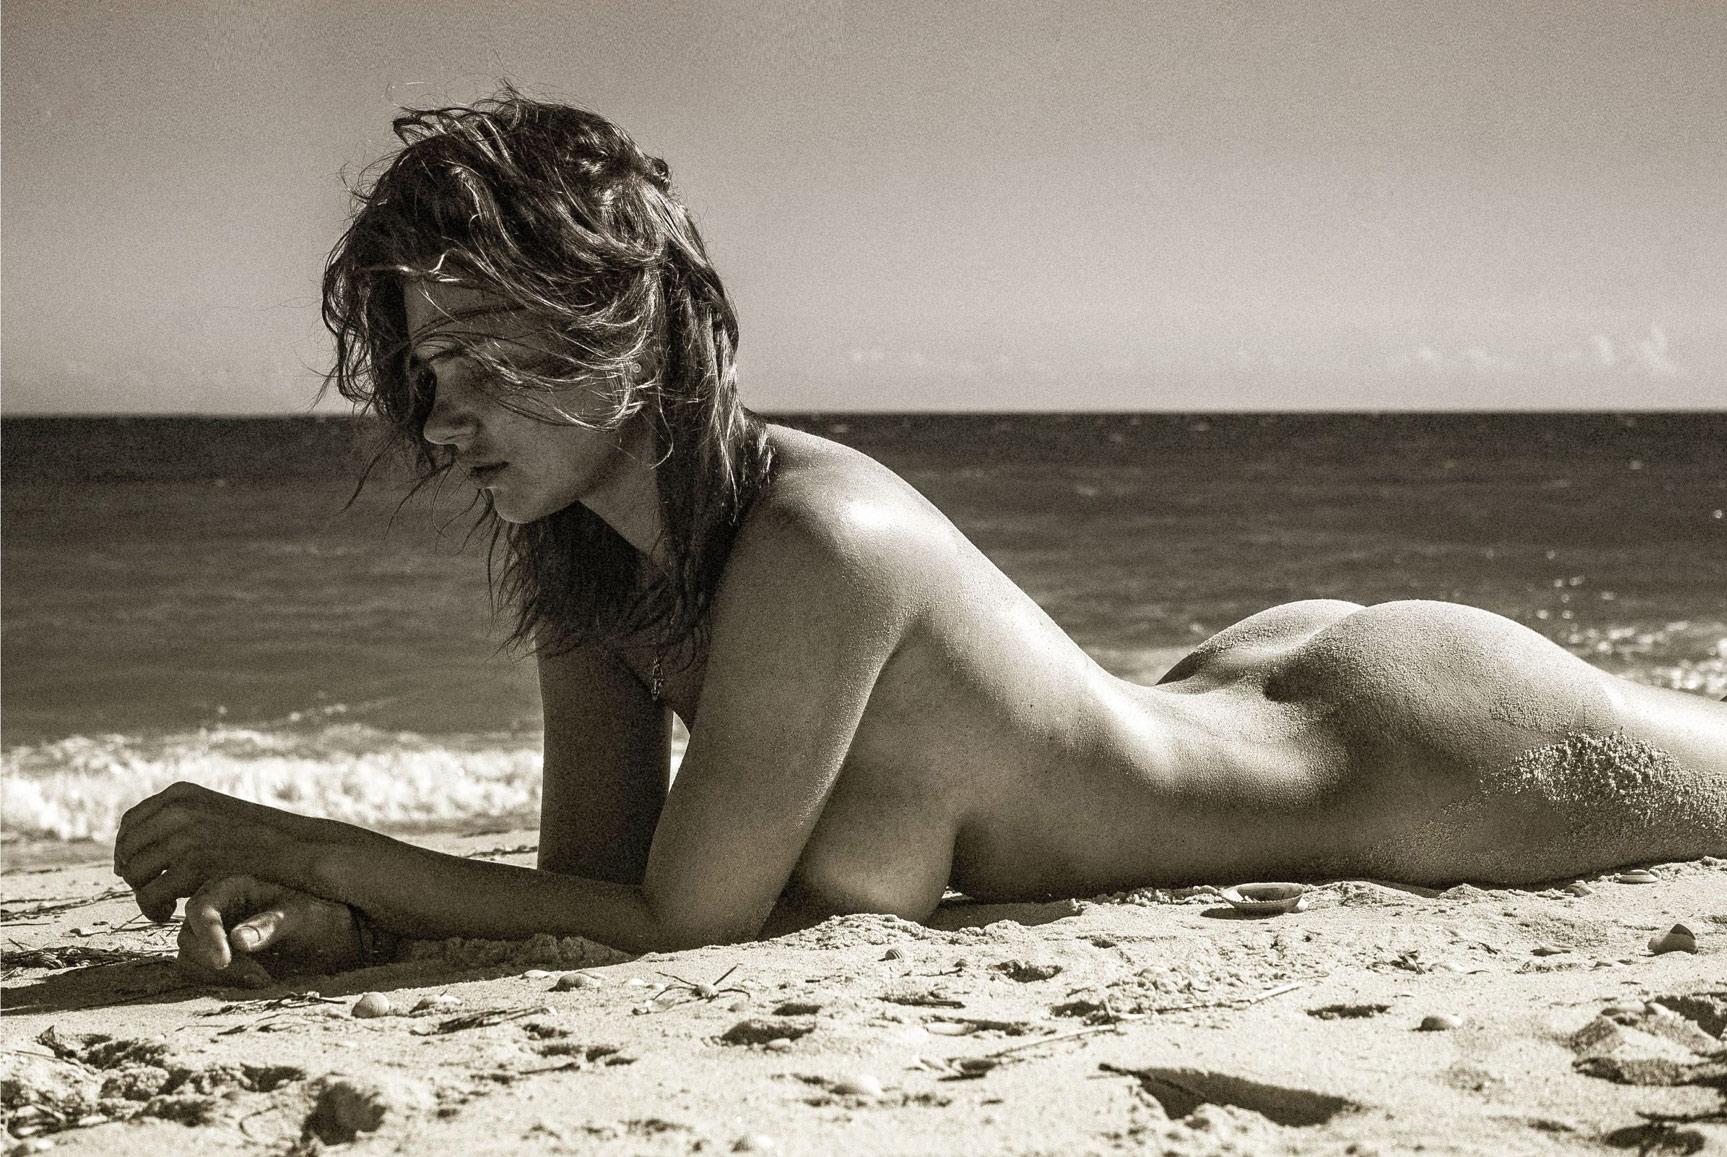 модель Виктория Липатова / Viktoria Lipatova nude by Orlando Goncalves - Insomnia Magazine Issue 01, April 2015